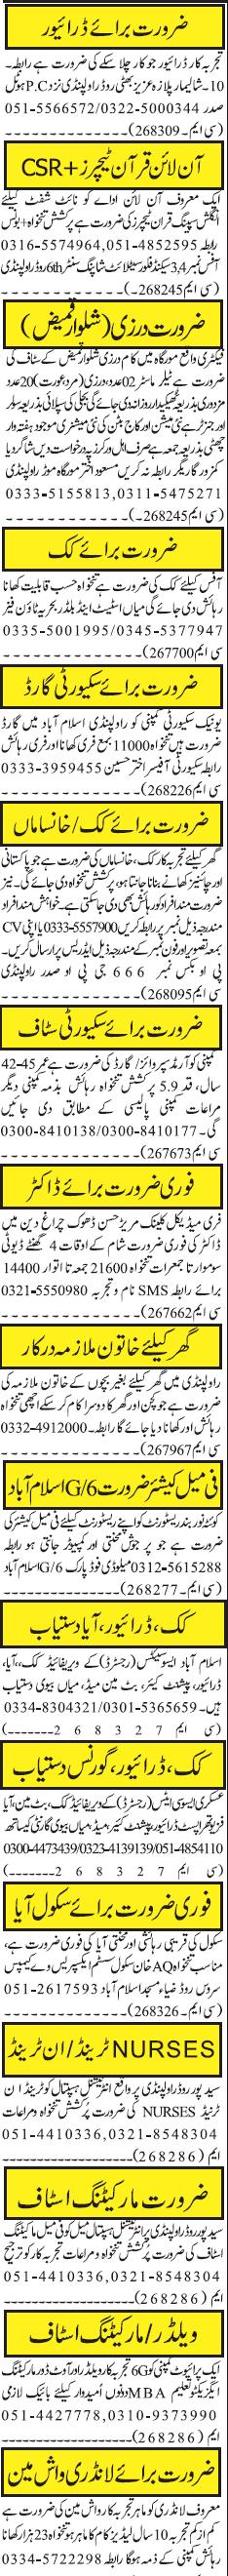 LTV Drivers, Online Quran Teachers, Tailors Job Opportunity